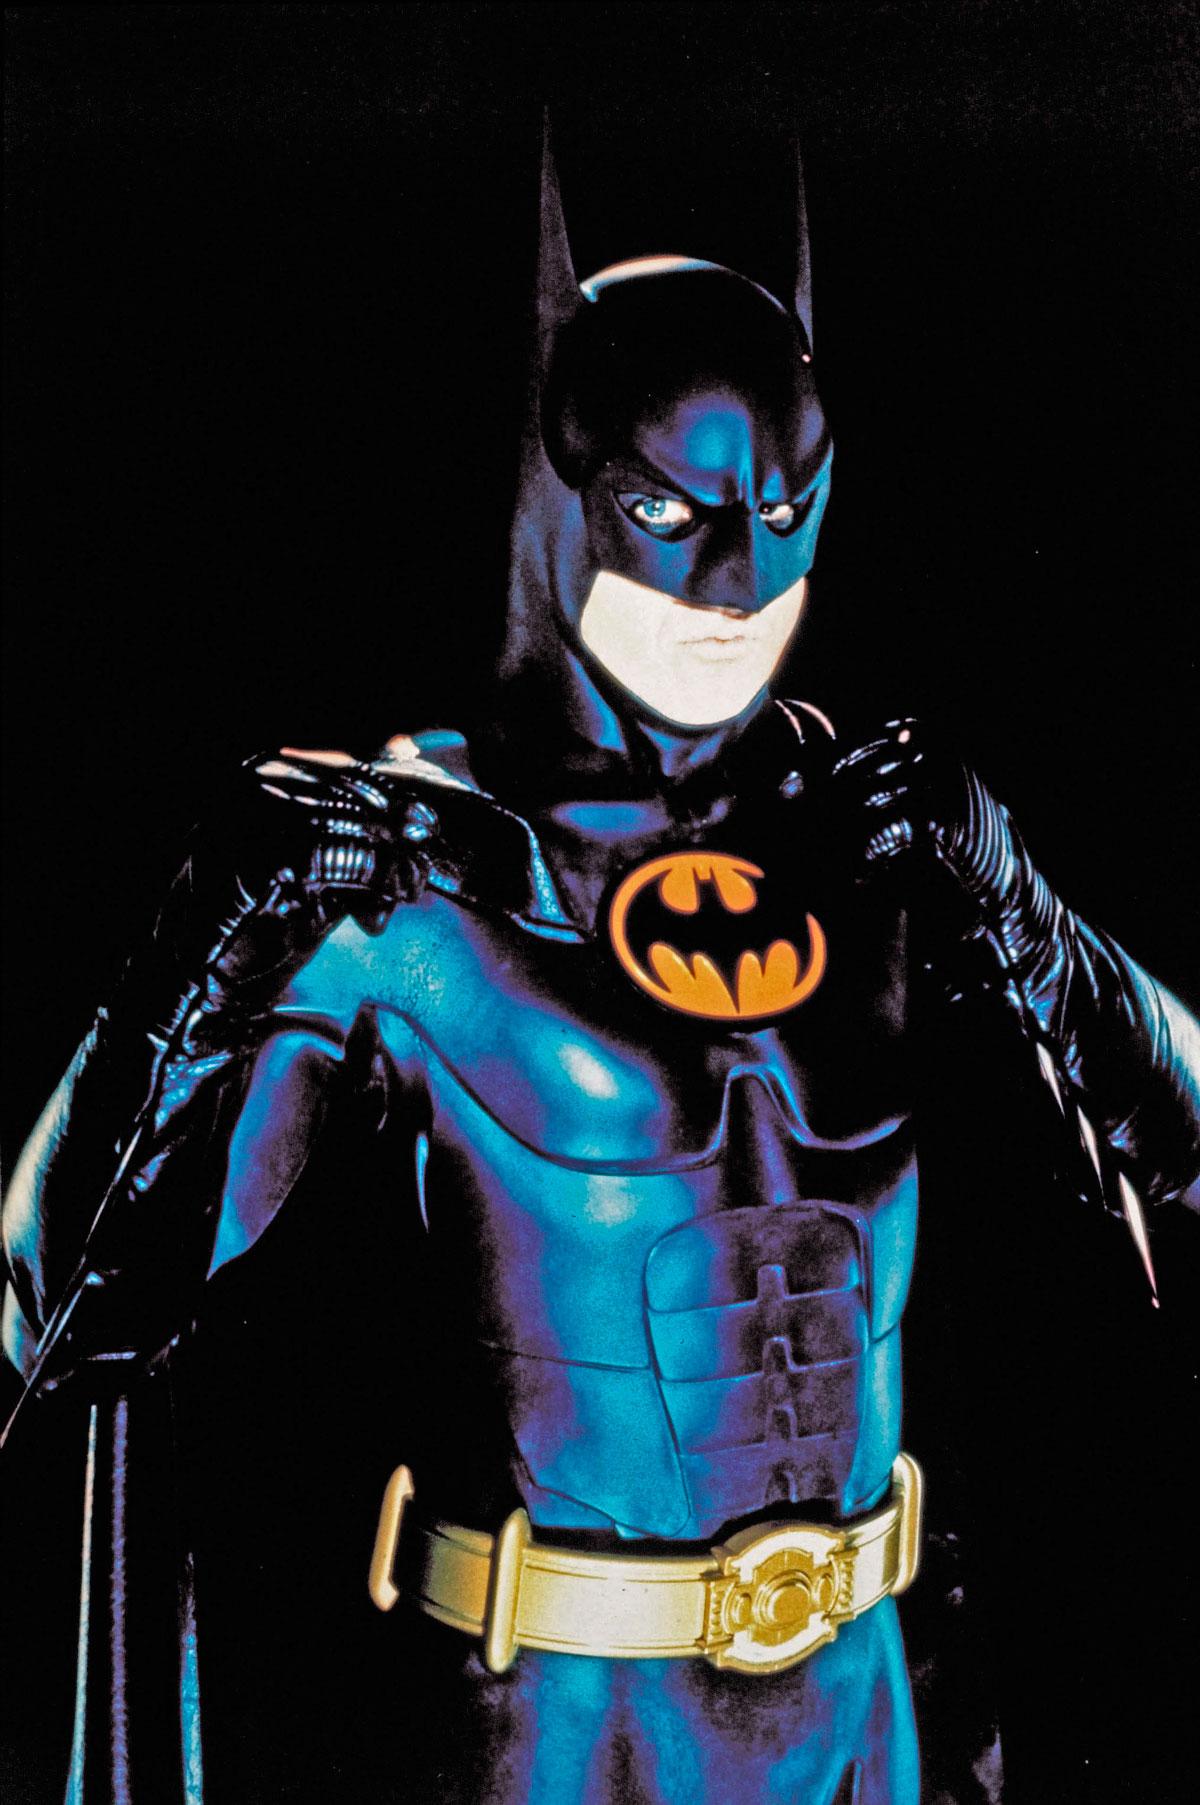 La evolución de la armadura en Batman Returns de Tim Burton